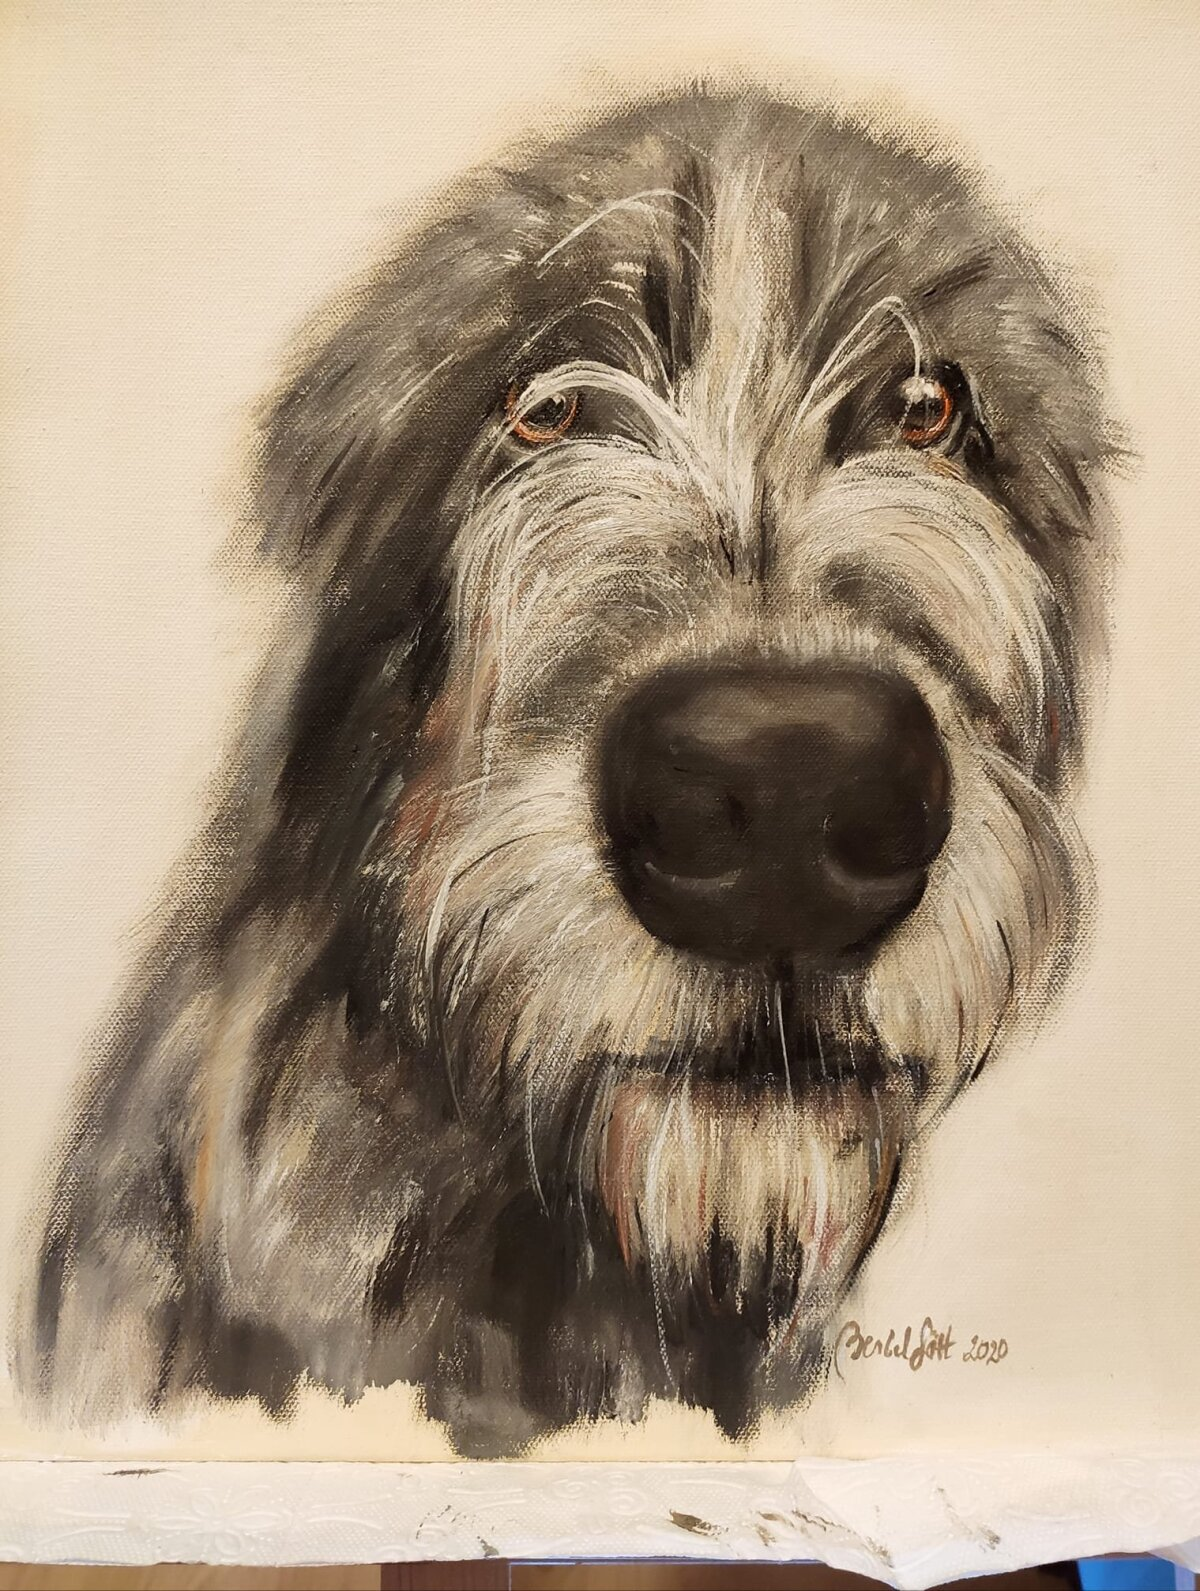 Berbeli joonistatud koer